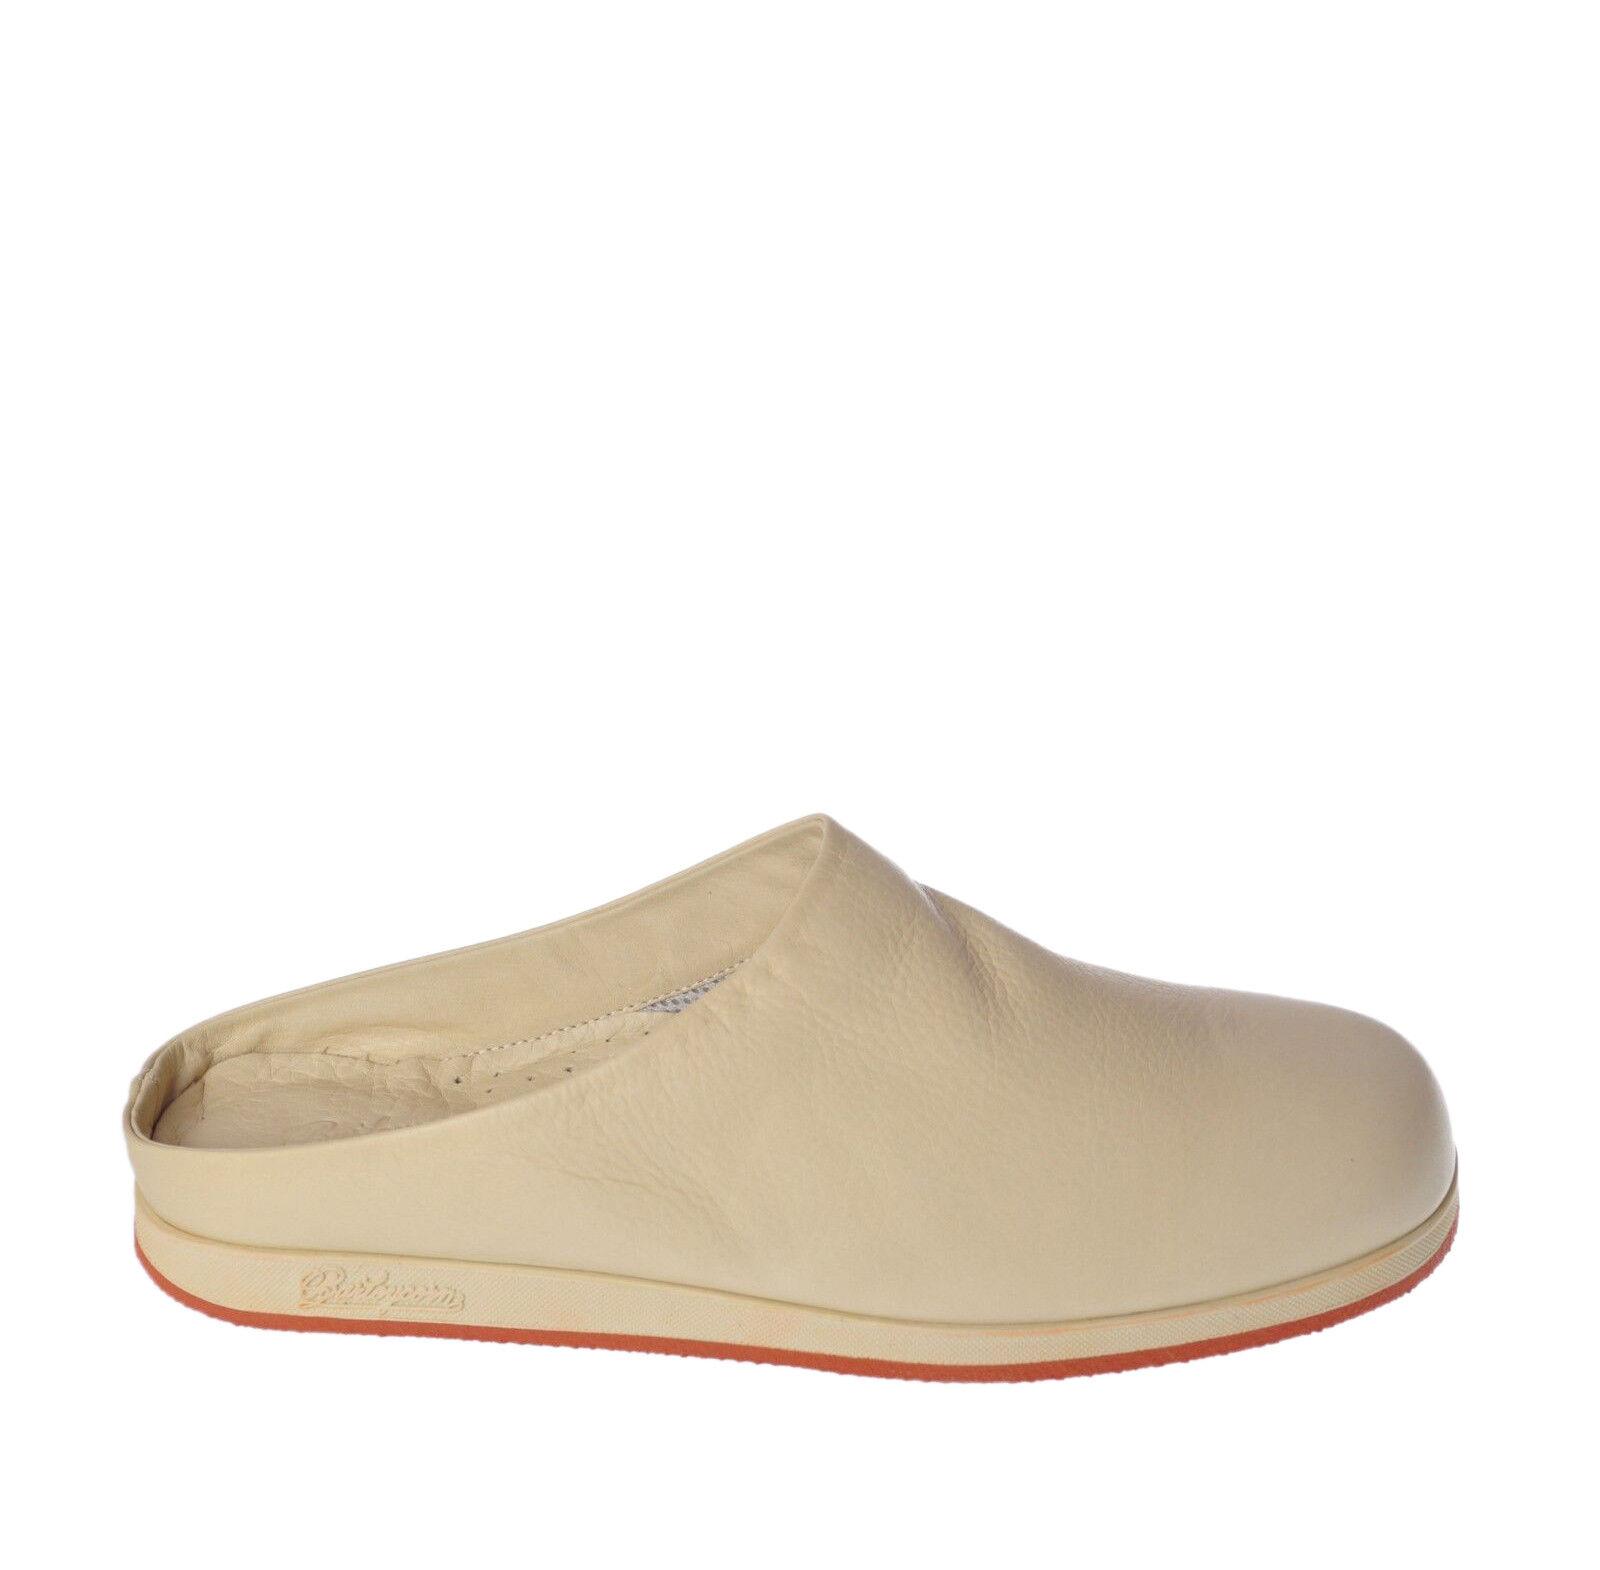 Barleycorn - chaussures-Moccasins - femme - blanc - 5143520C183932